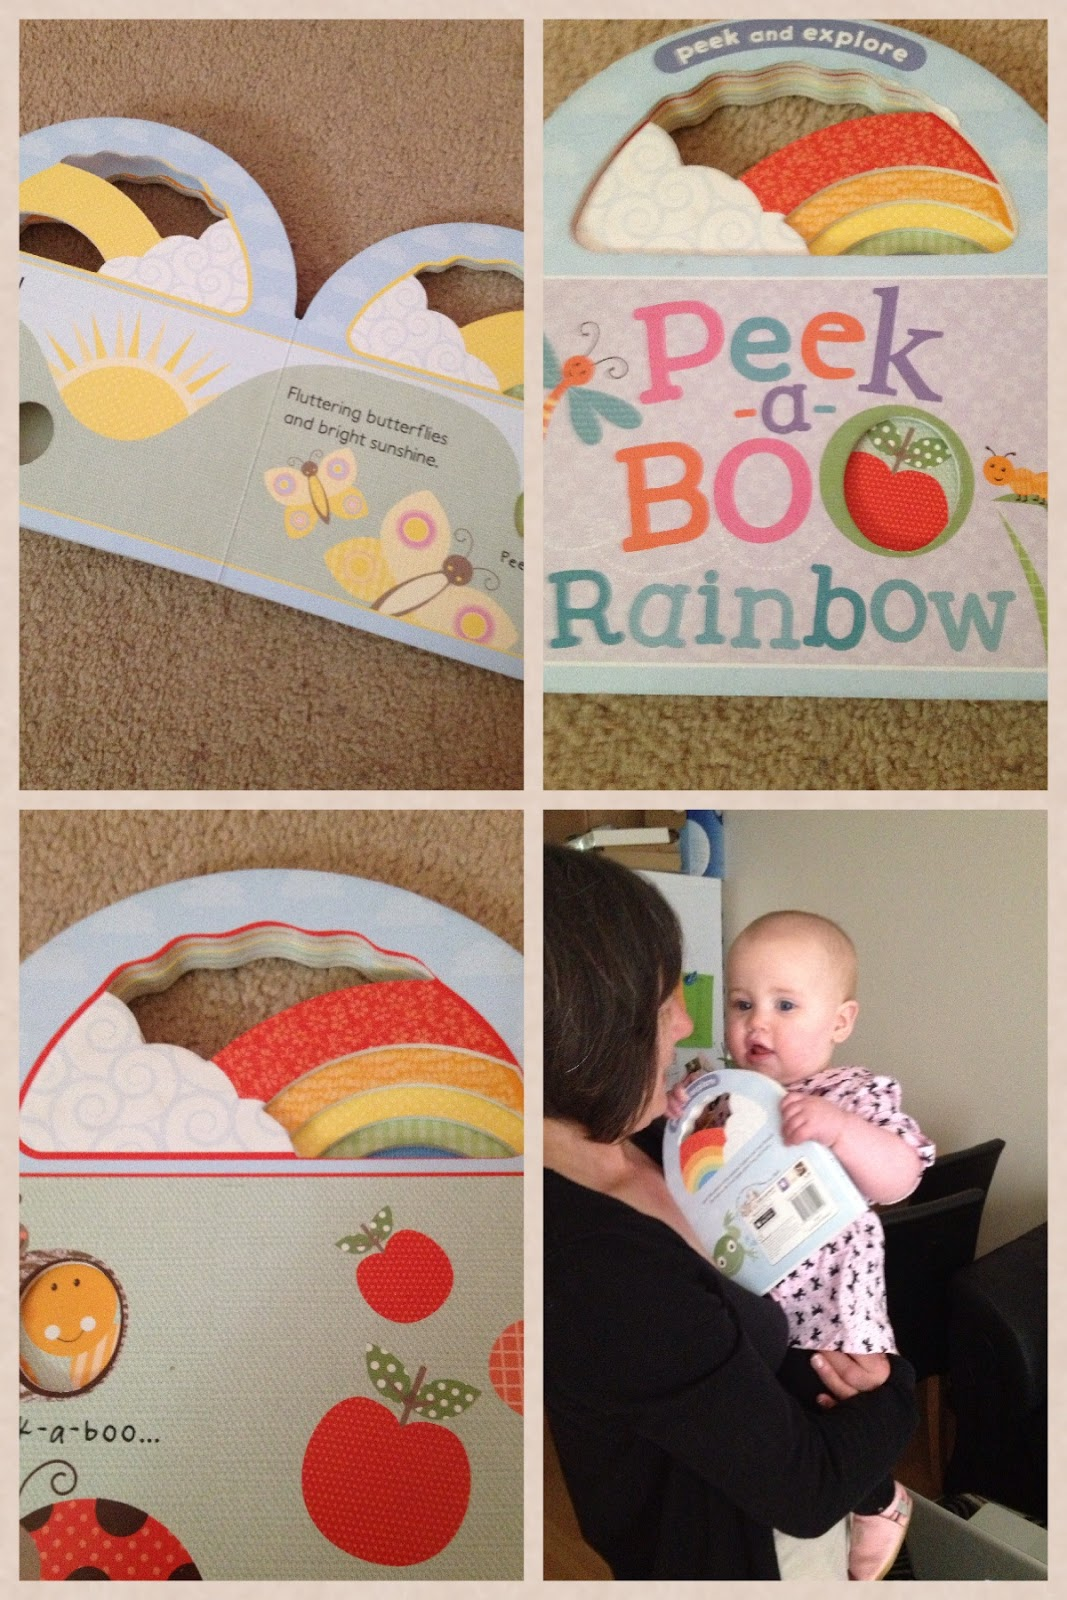 Mama Mummy Mum: Parragon book Reviews